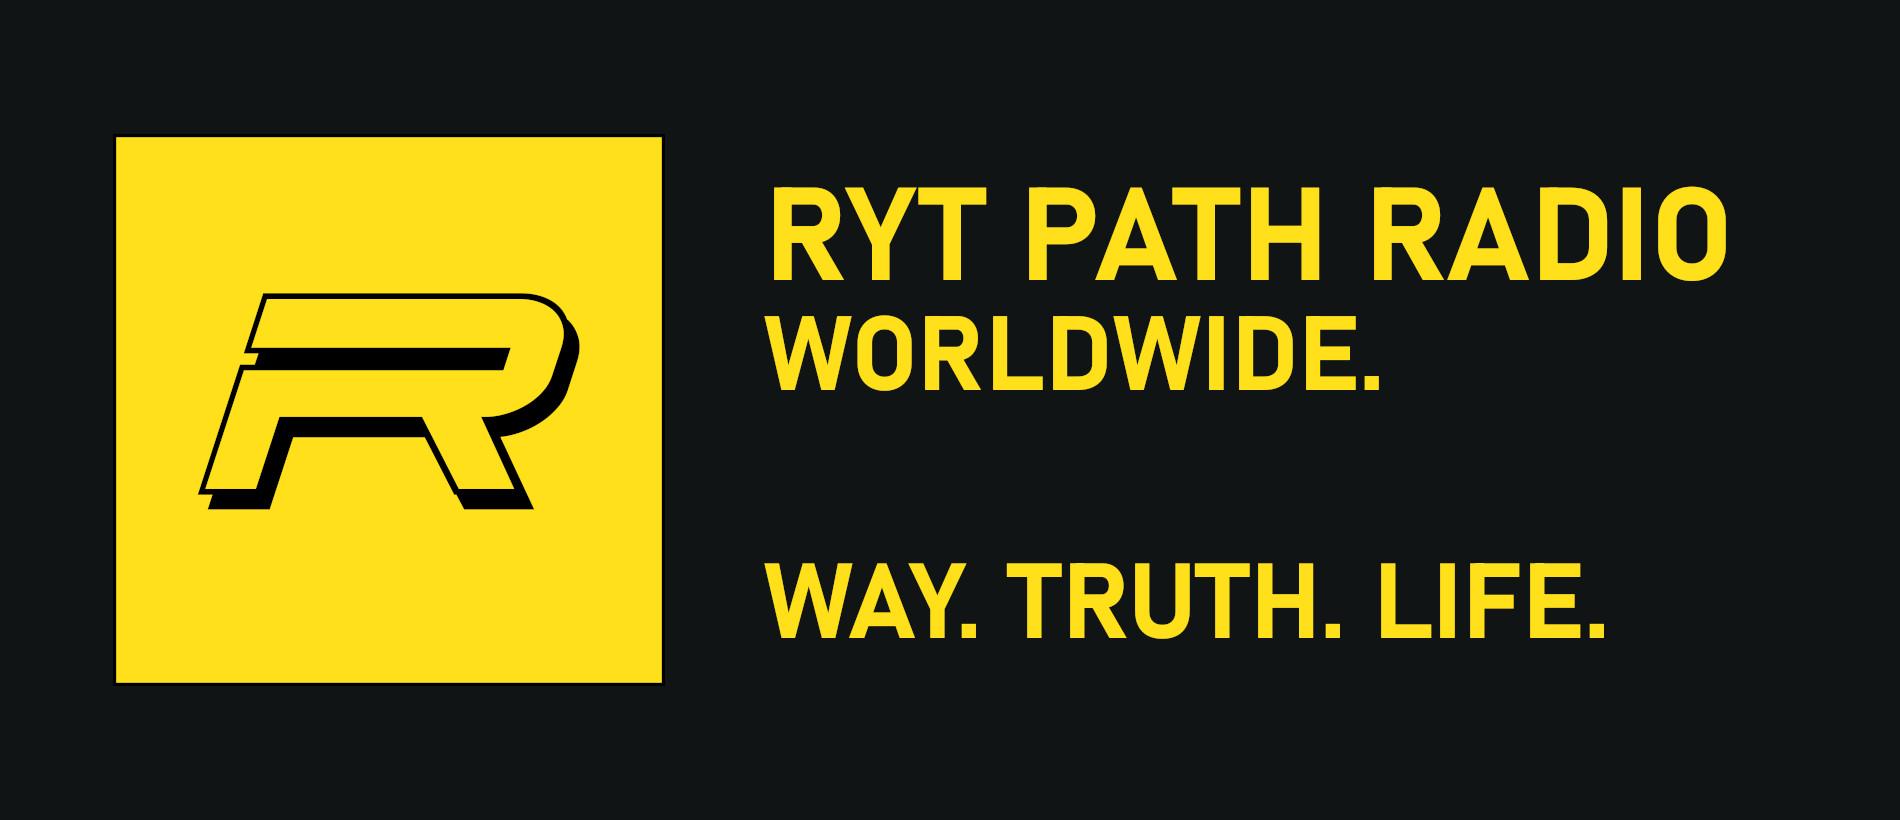 Ryt Path Co. logo and Ryt Path Radio Worldwide text.